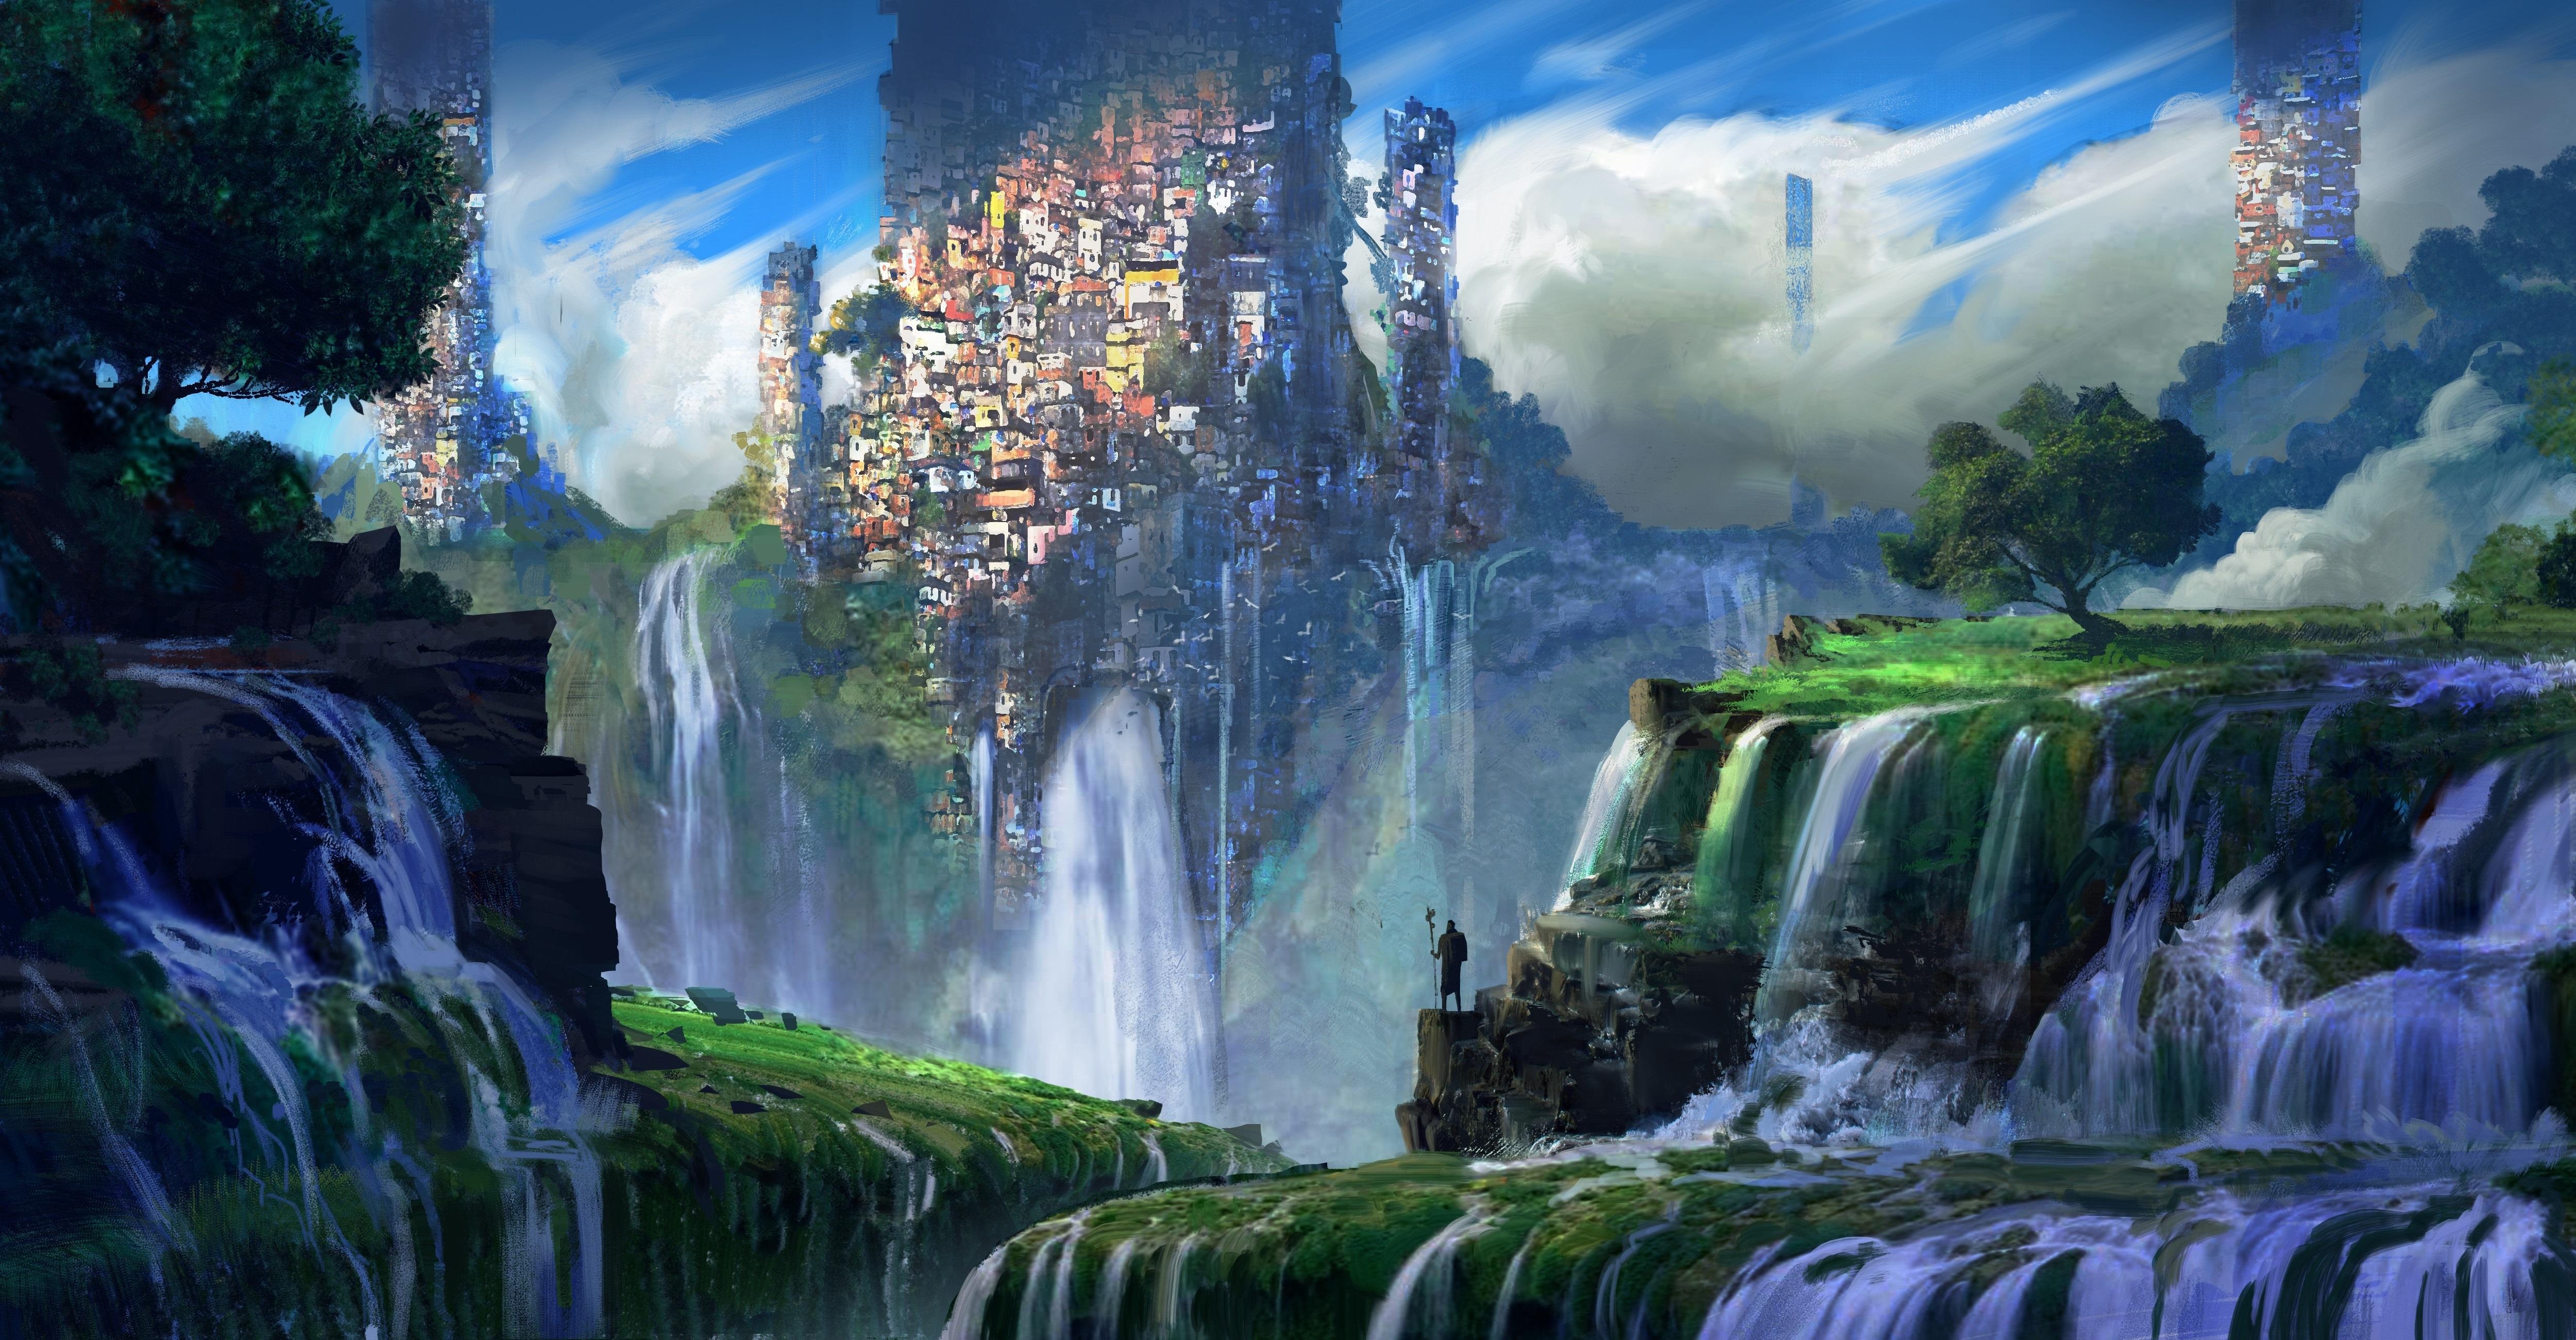 General 5000x2600 illustration favela mountains plants waterfall warrior city fantasy art landscape